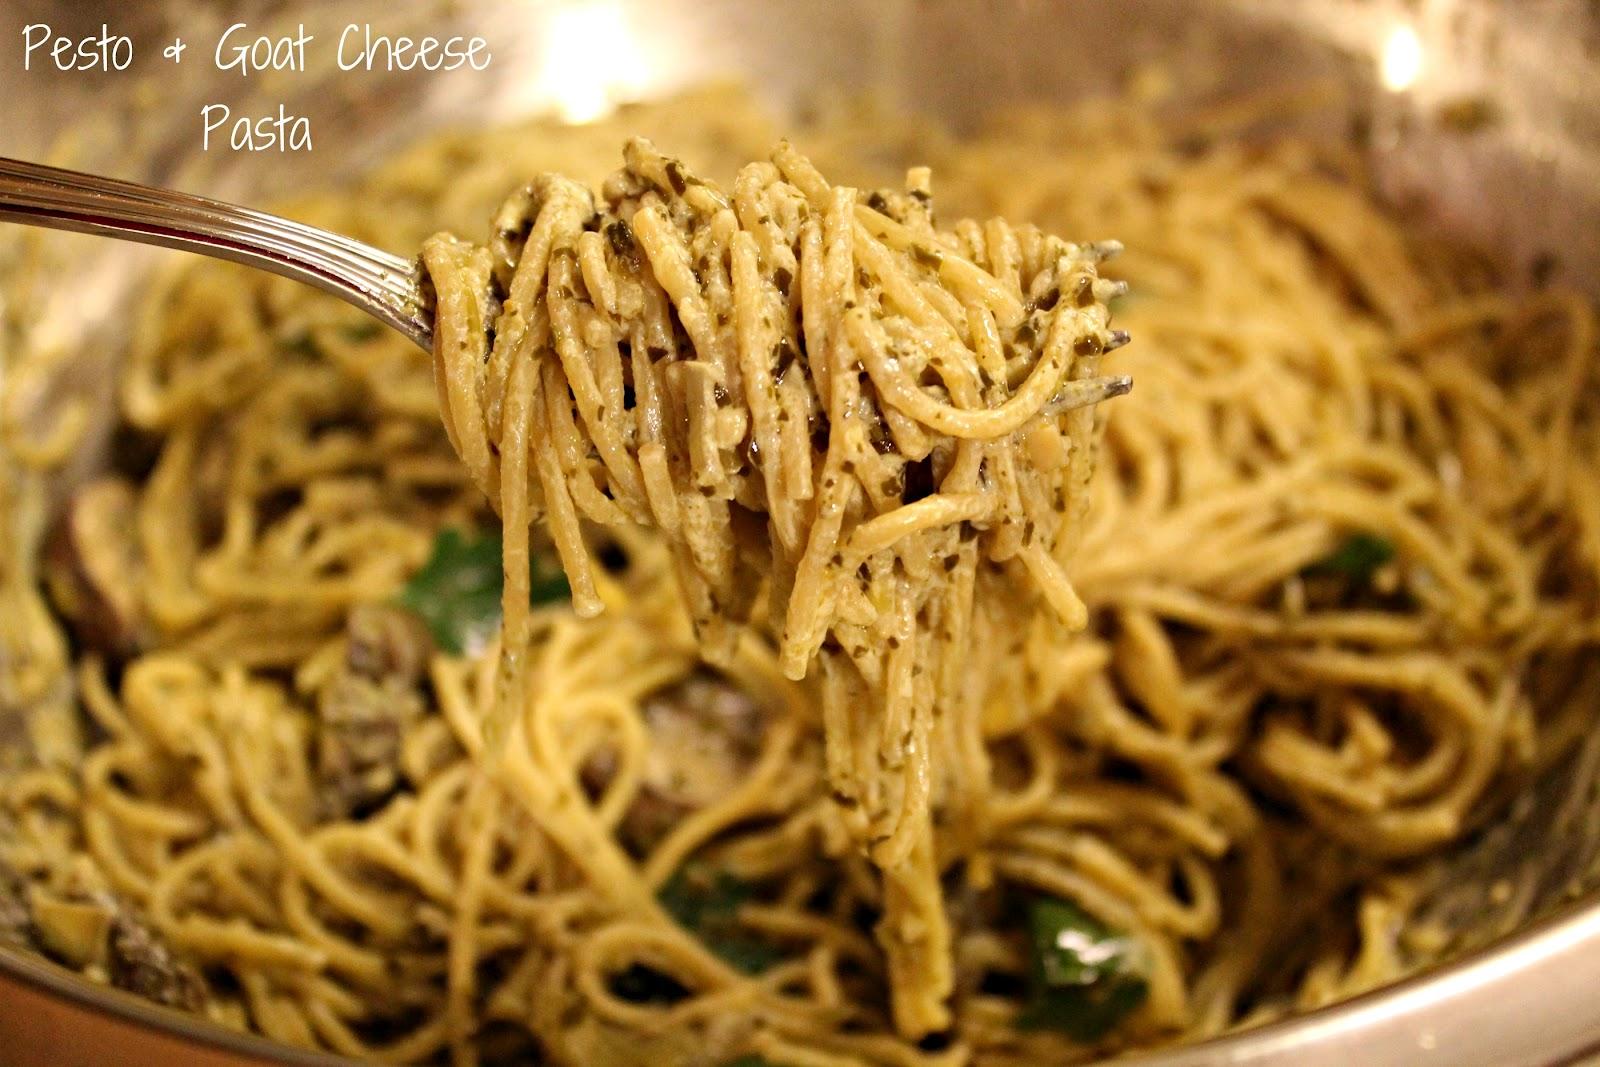 Pesto & Goat Cheese Pasta